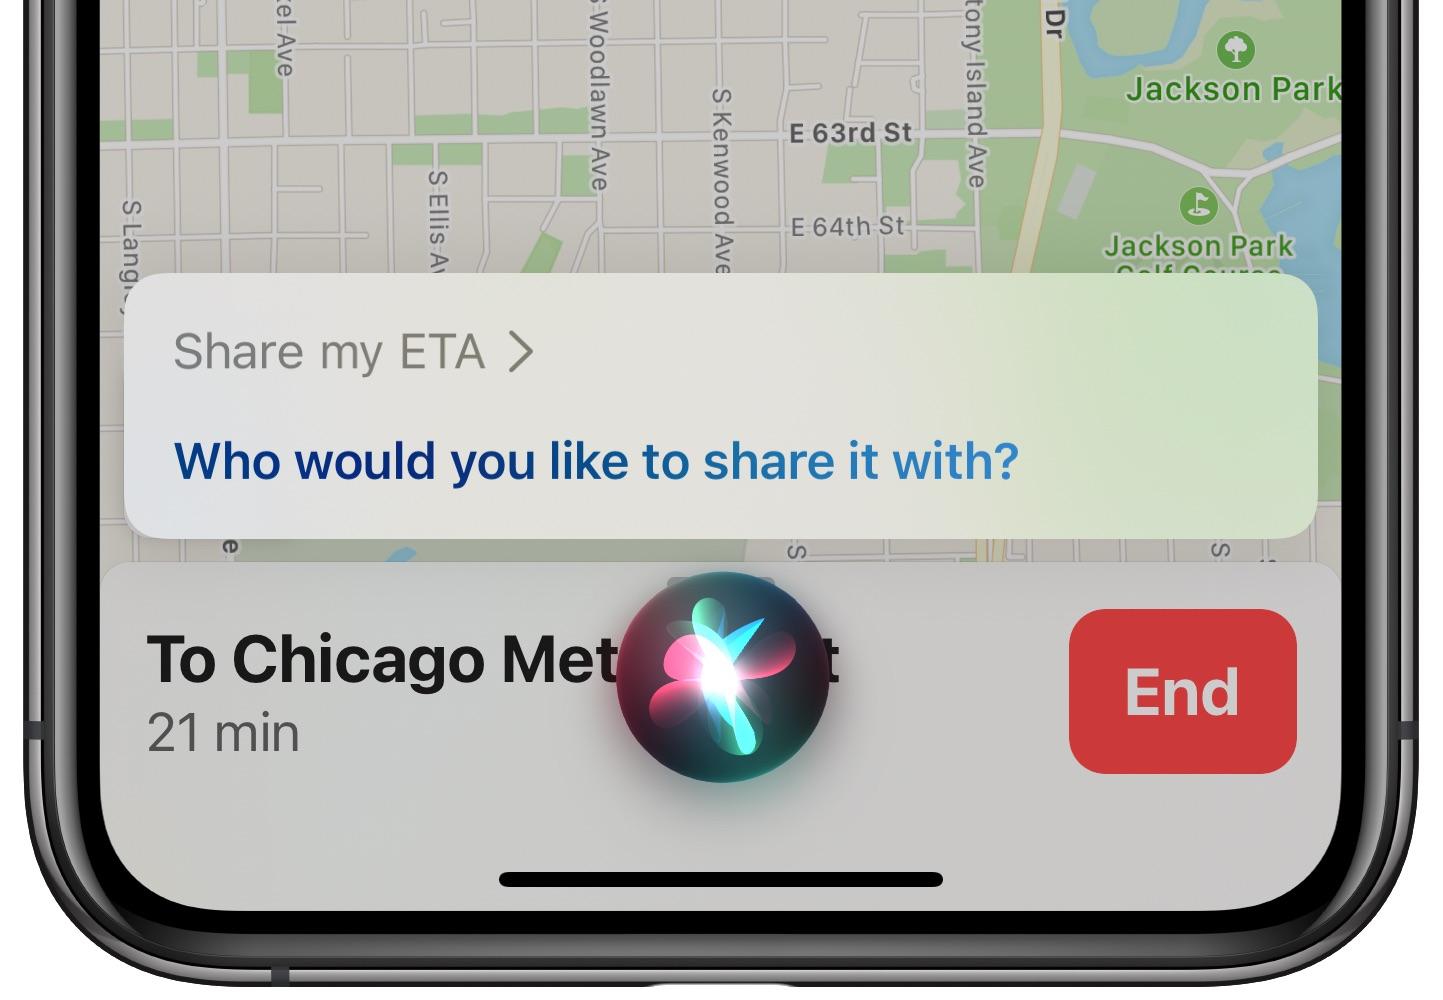 share eta apple maps siri - iPhone screenshot